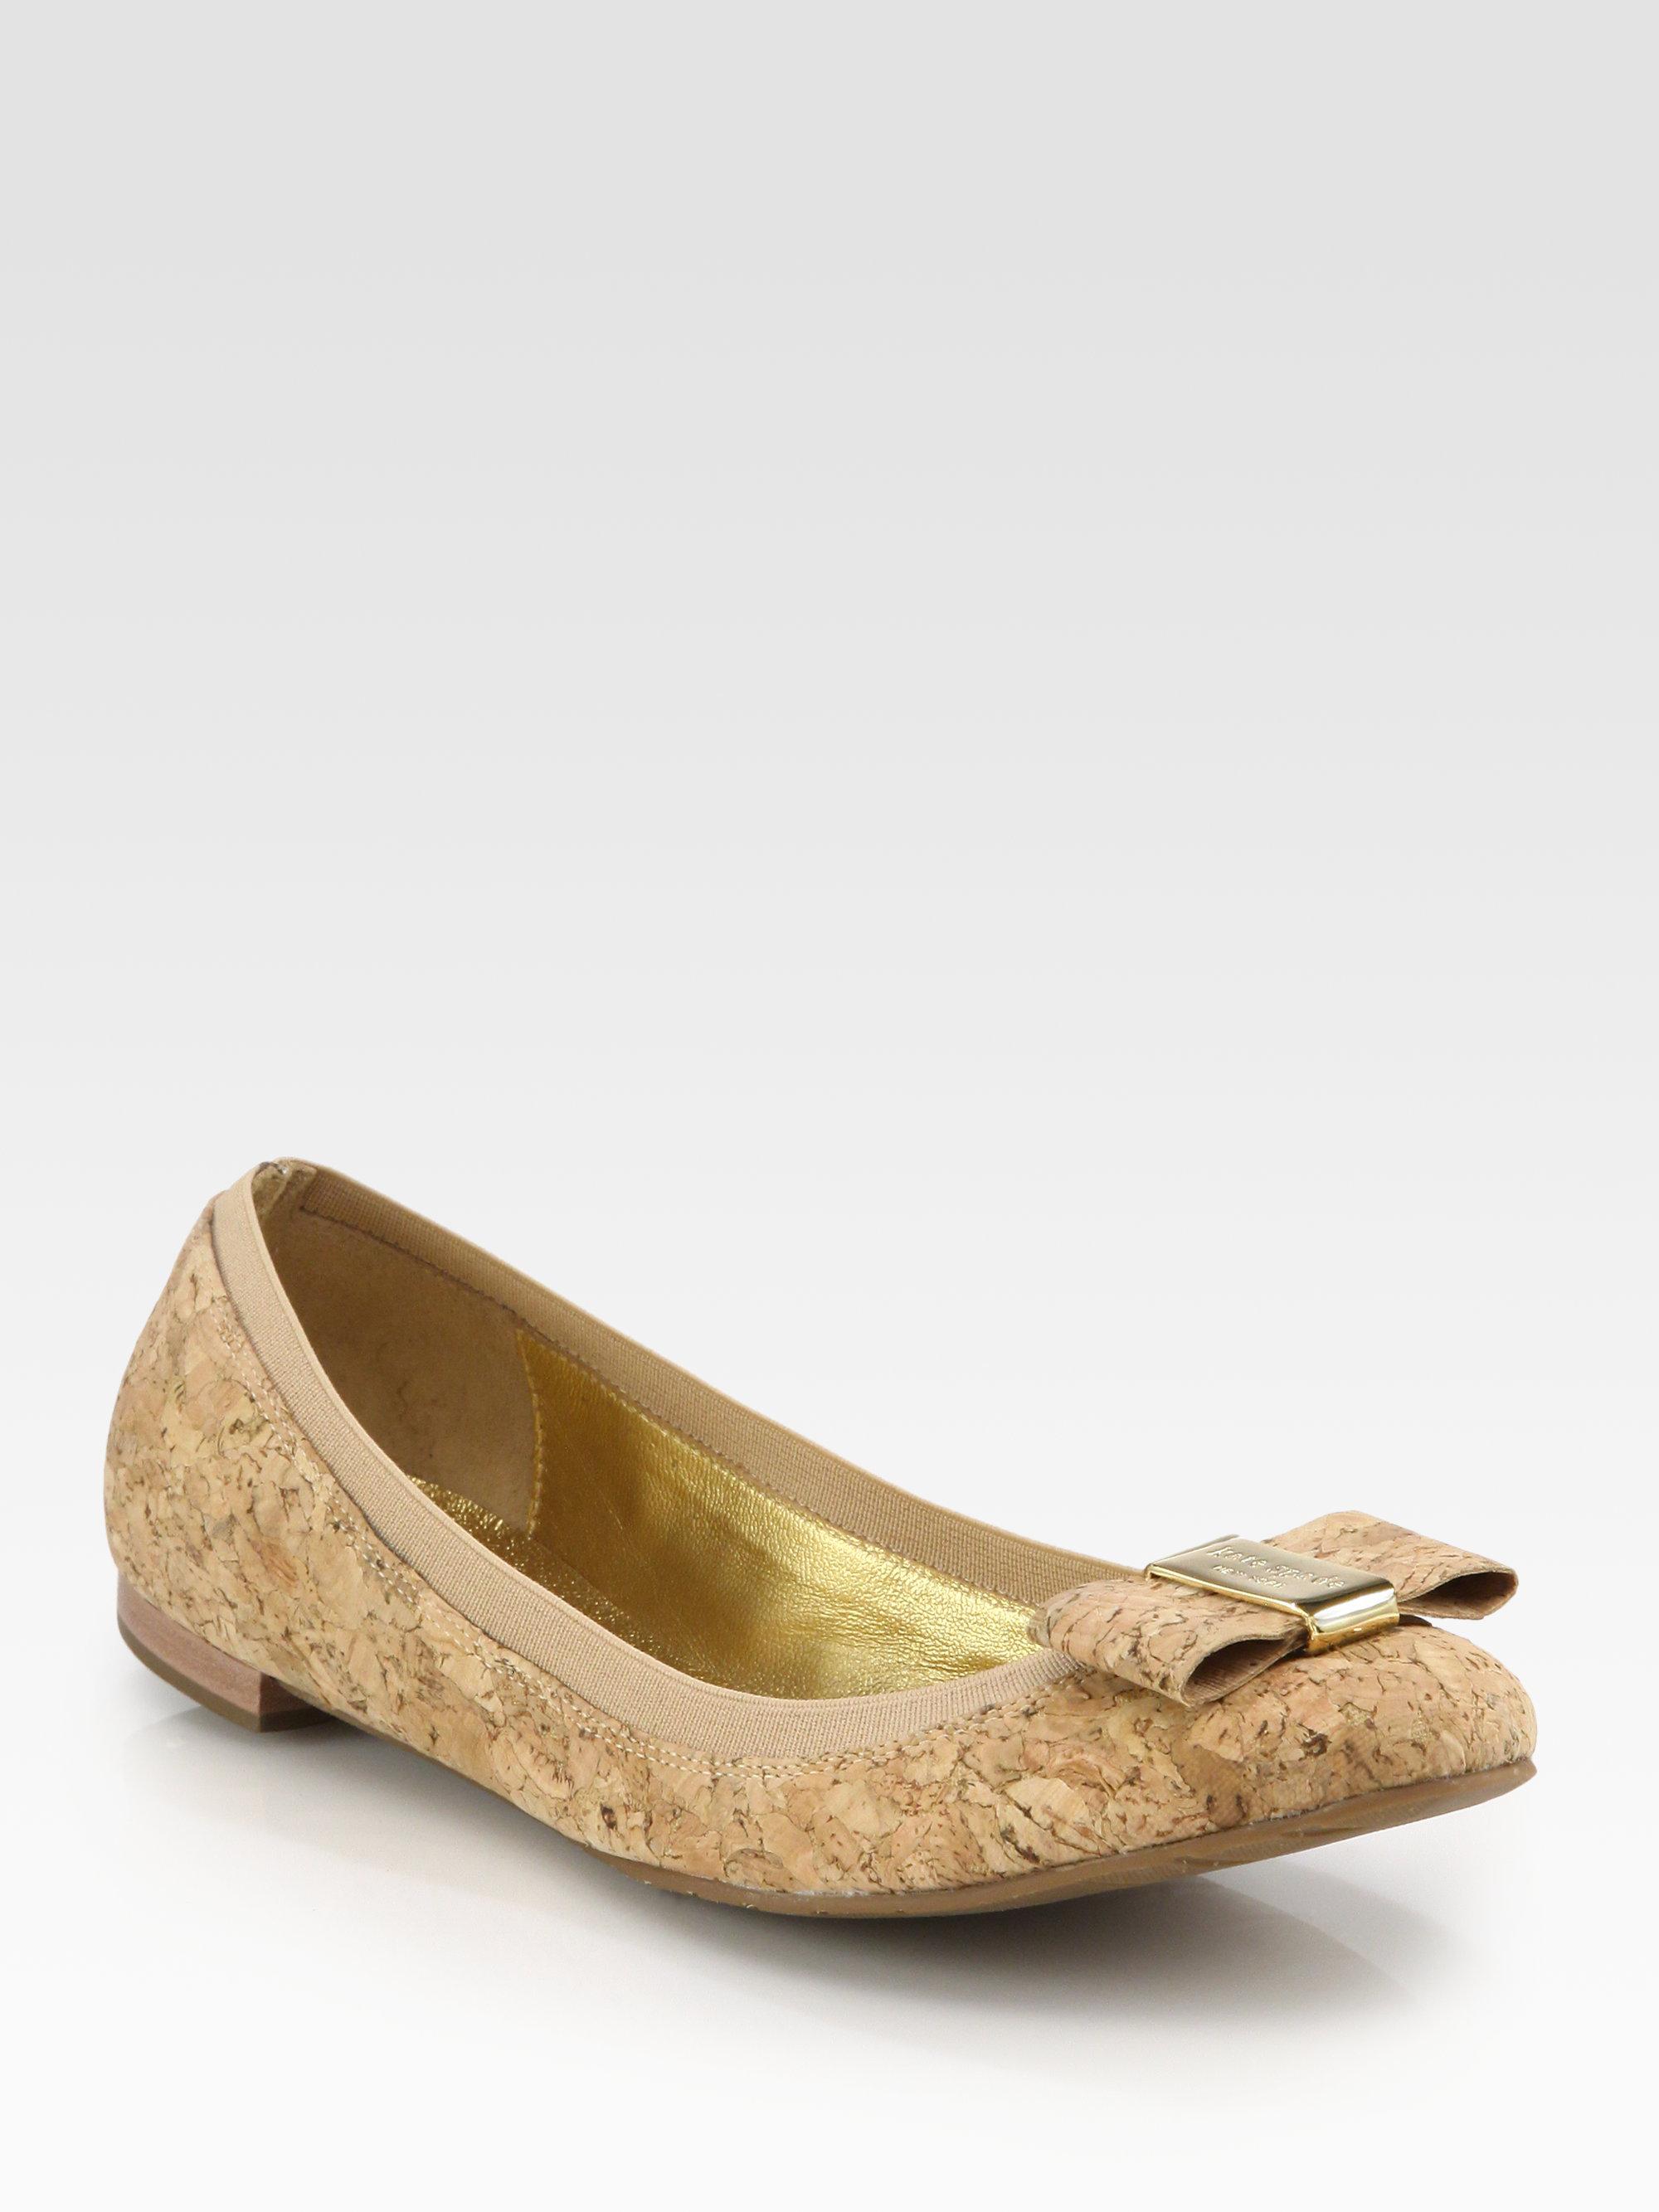 5ac671c89ed1 Lyst - Kate Spade Tock Cork Bow Ballet Flats in Metallic